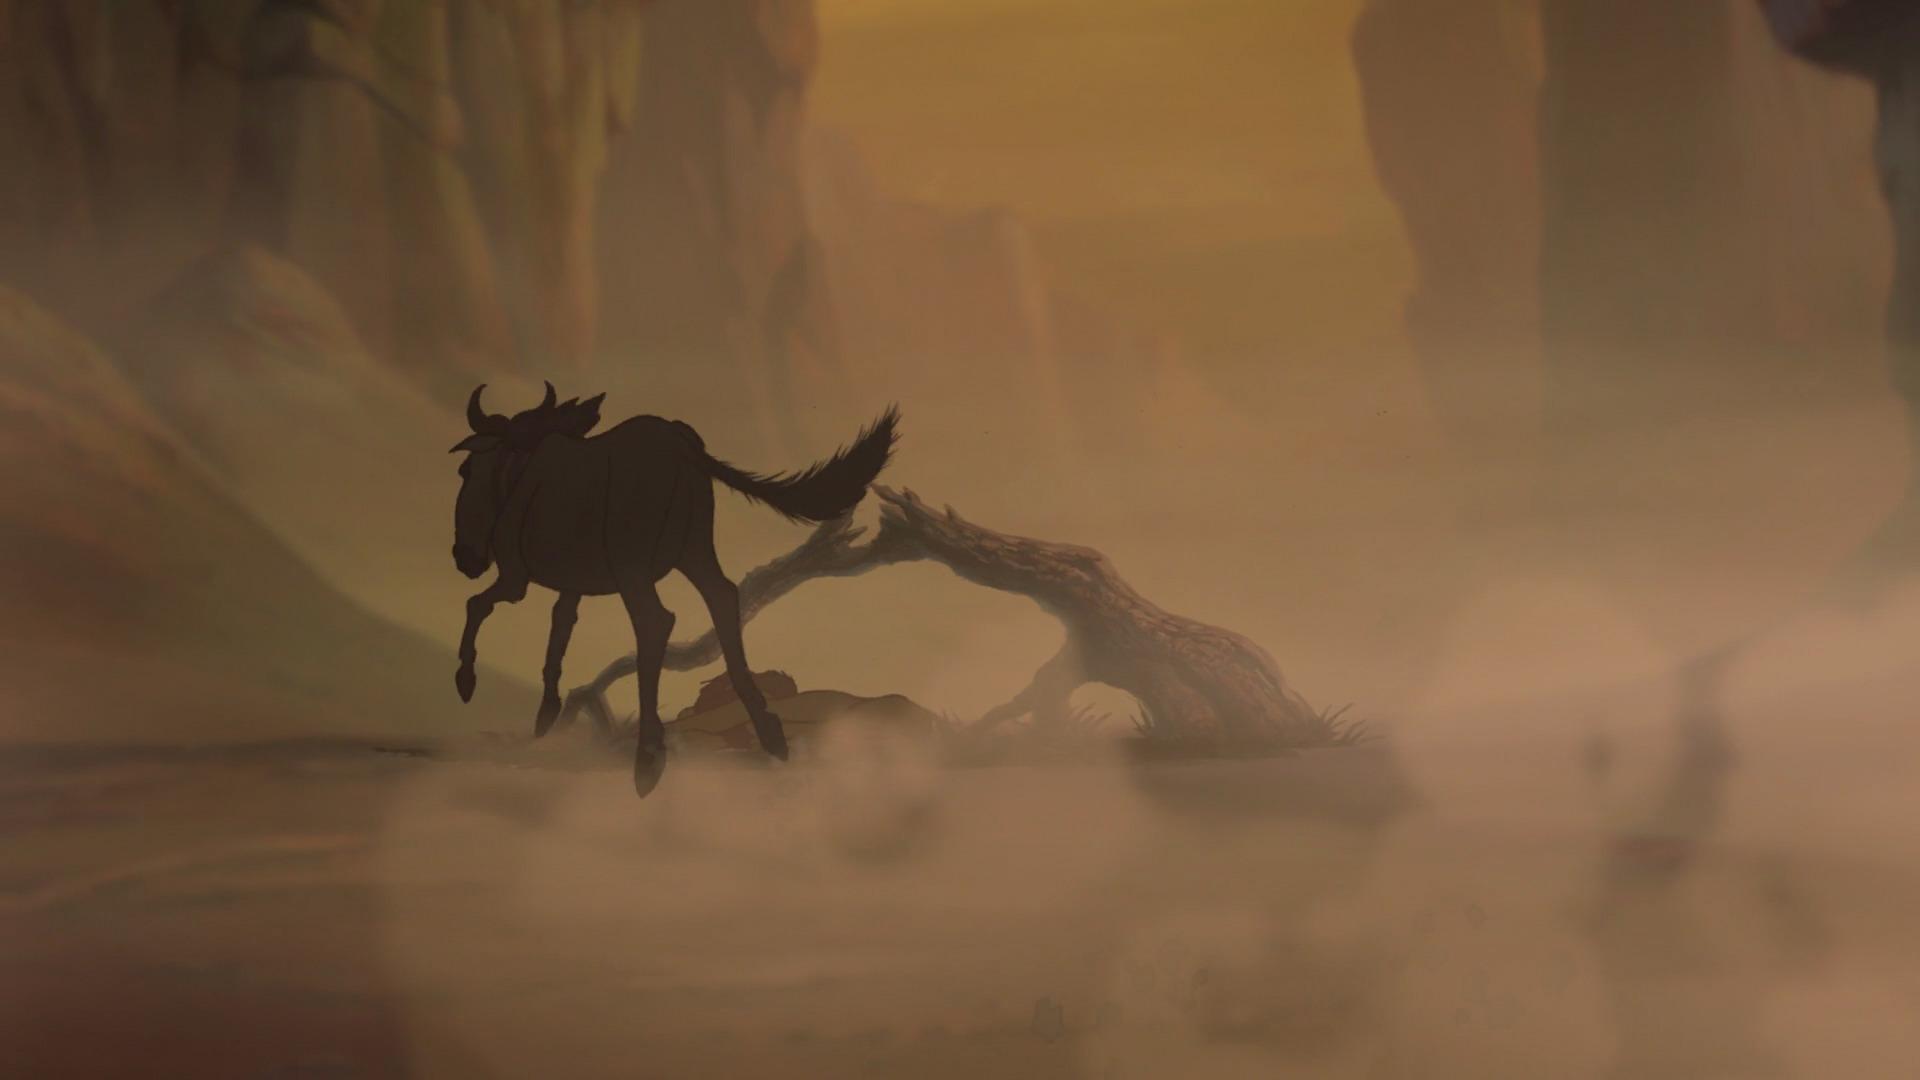 Image Lion King Disneyscreencaps Com 4243 Jpg Disneywiki